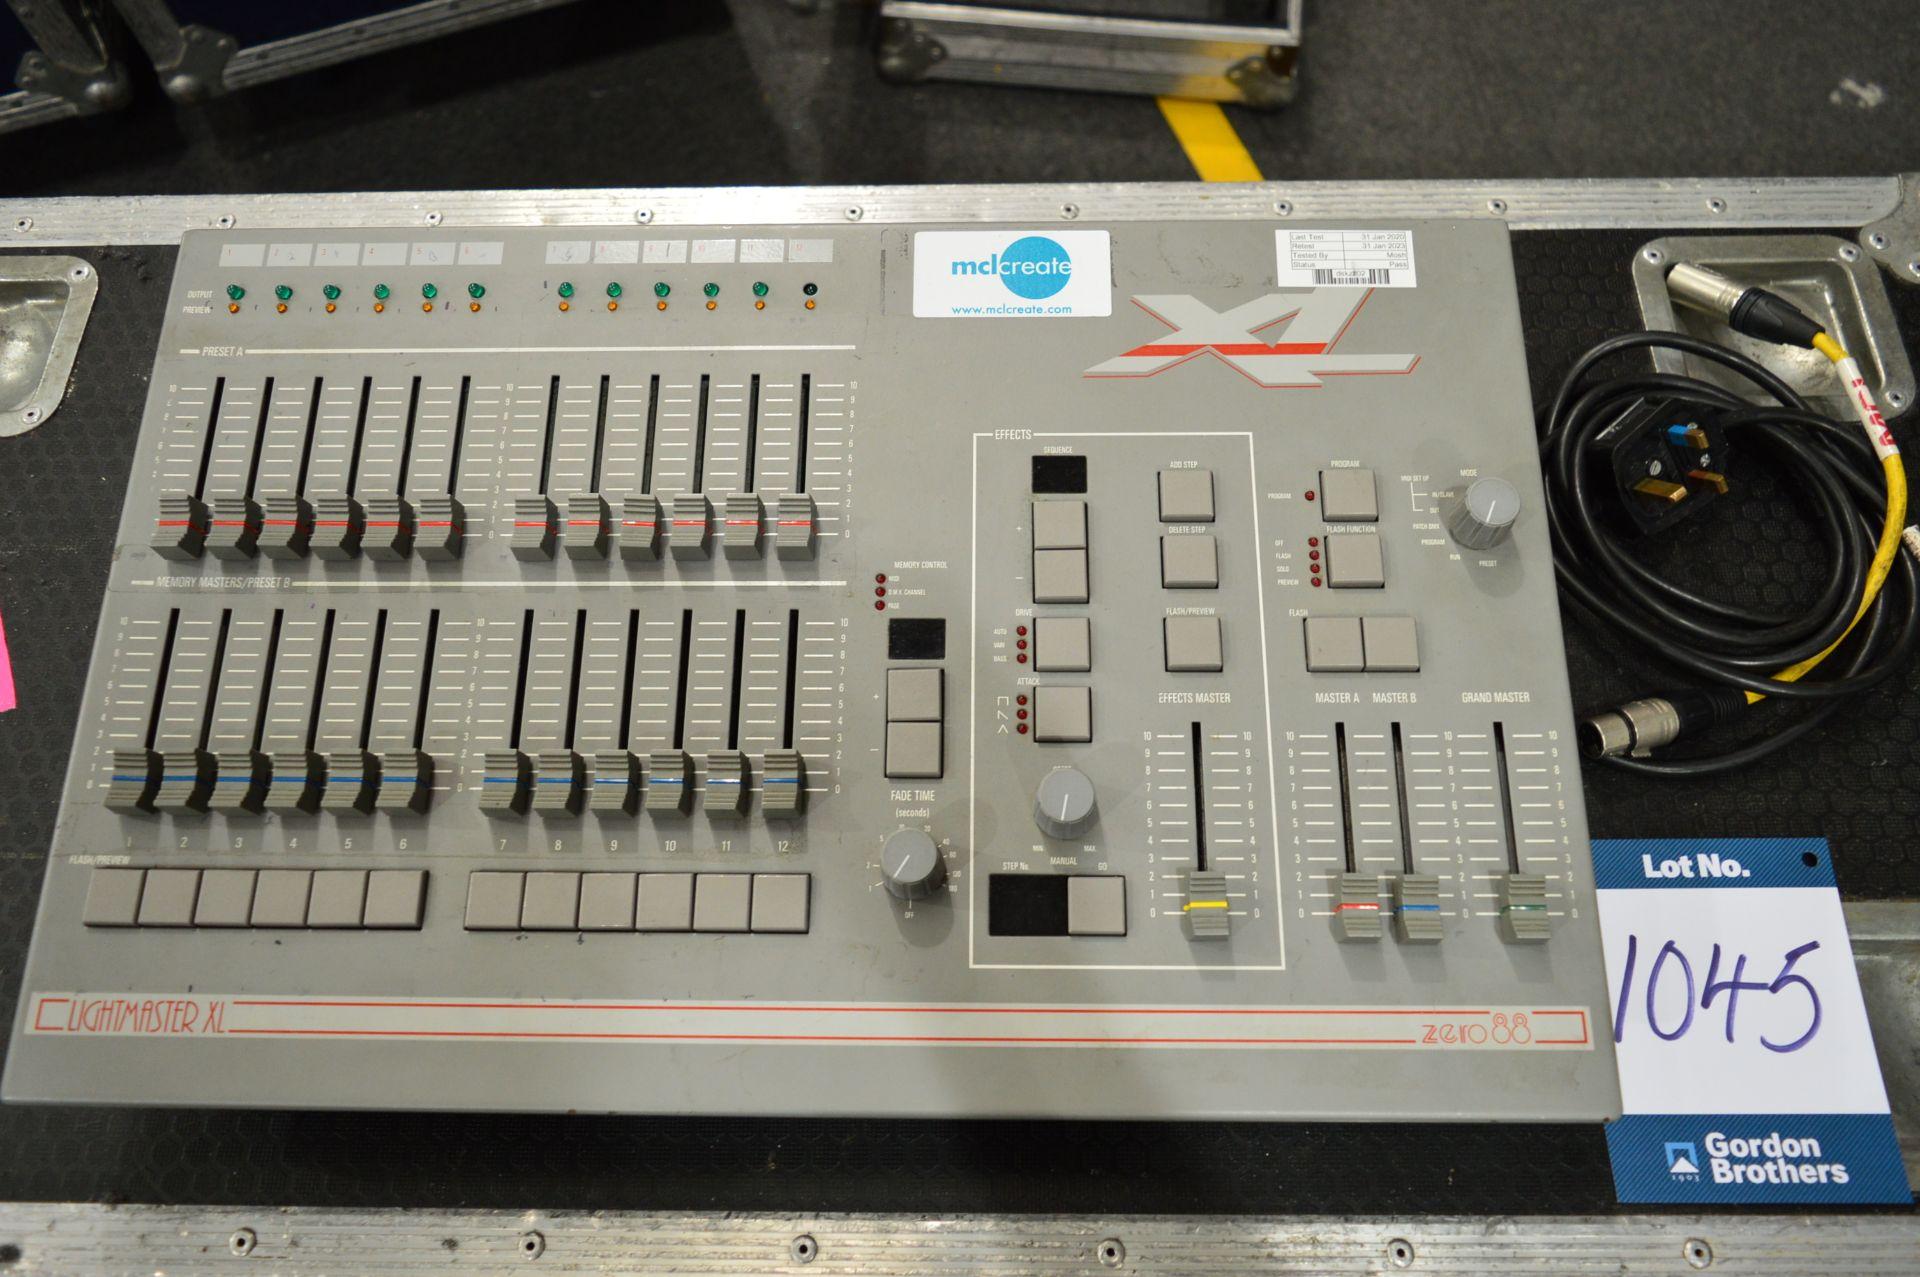 Lot 1045 - Zero88, Lightmaster XL lighting console controller